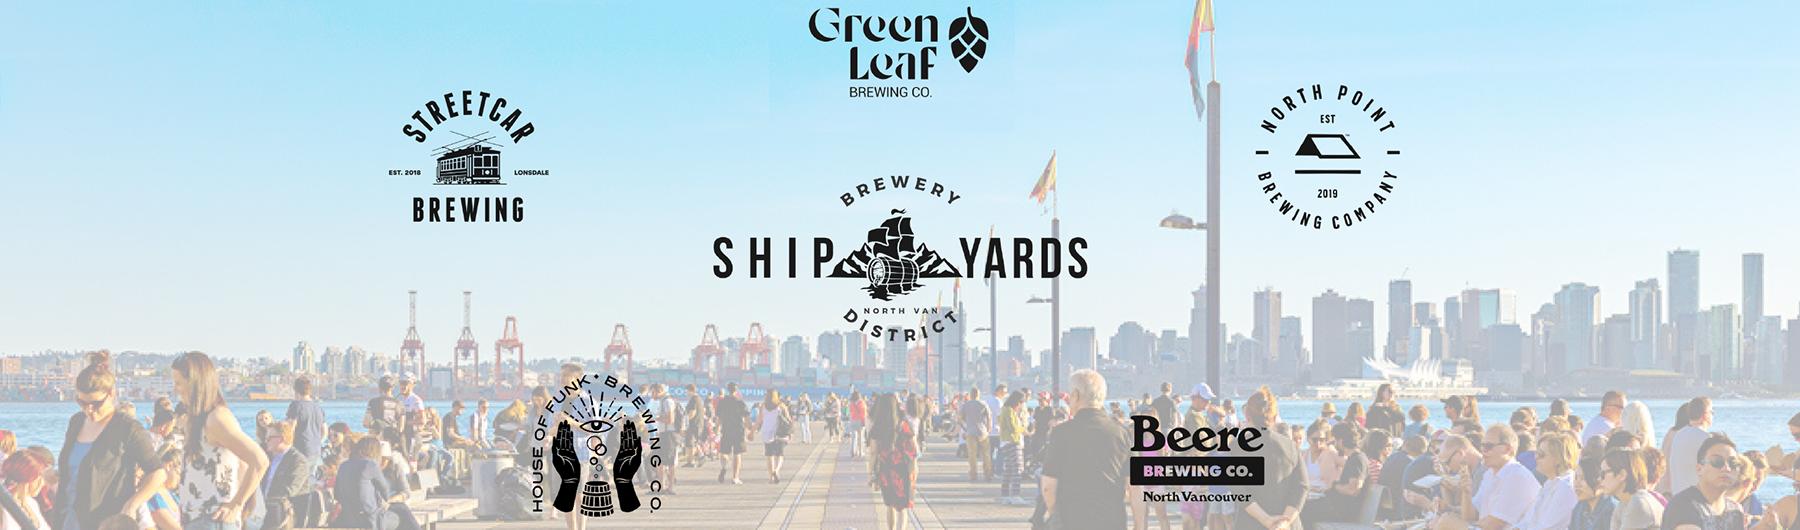 Shipyards 2020 Family Day Brewery Crawl